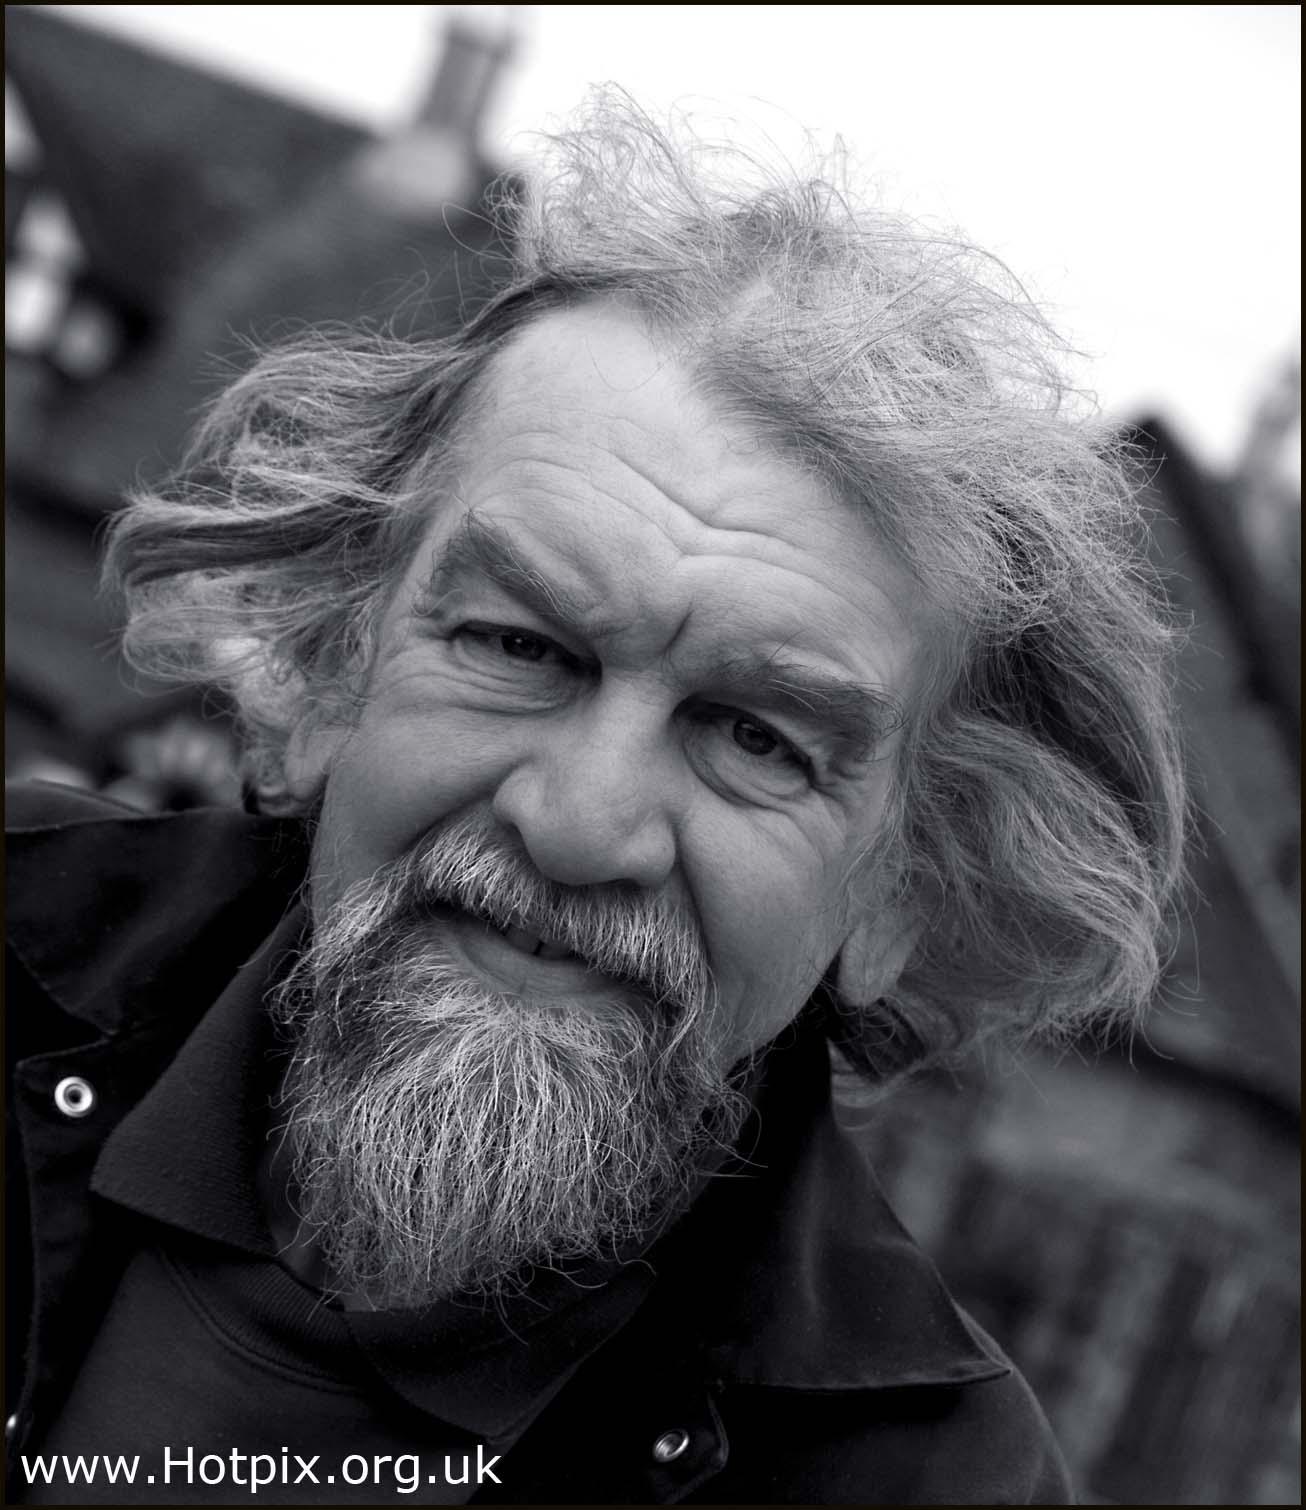 beard,bearded,men,old,beardy,work,working,cheshire,england beard,england,blakemeere,northwich,sandiway,A556,road,people,person,male,gentleman,homme,oap,older,wise,experience,experienced,blakemere,HDR,photomatix,sex,sexy,HOT PIX,tony smith photography,tdktony,tdk,tony,tdktonysmith